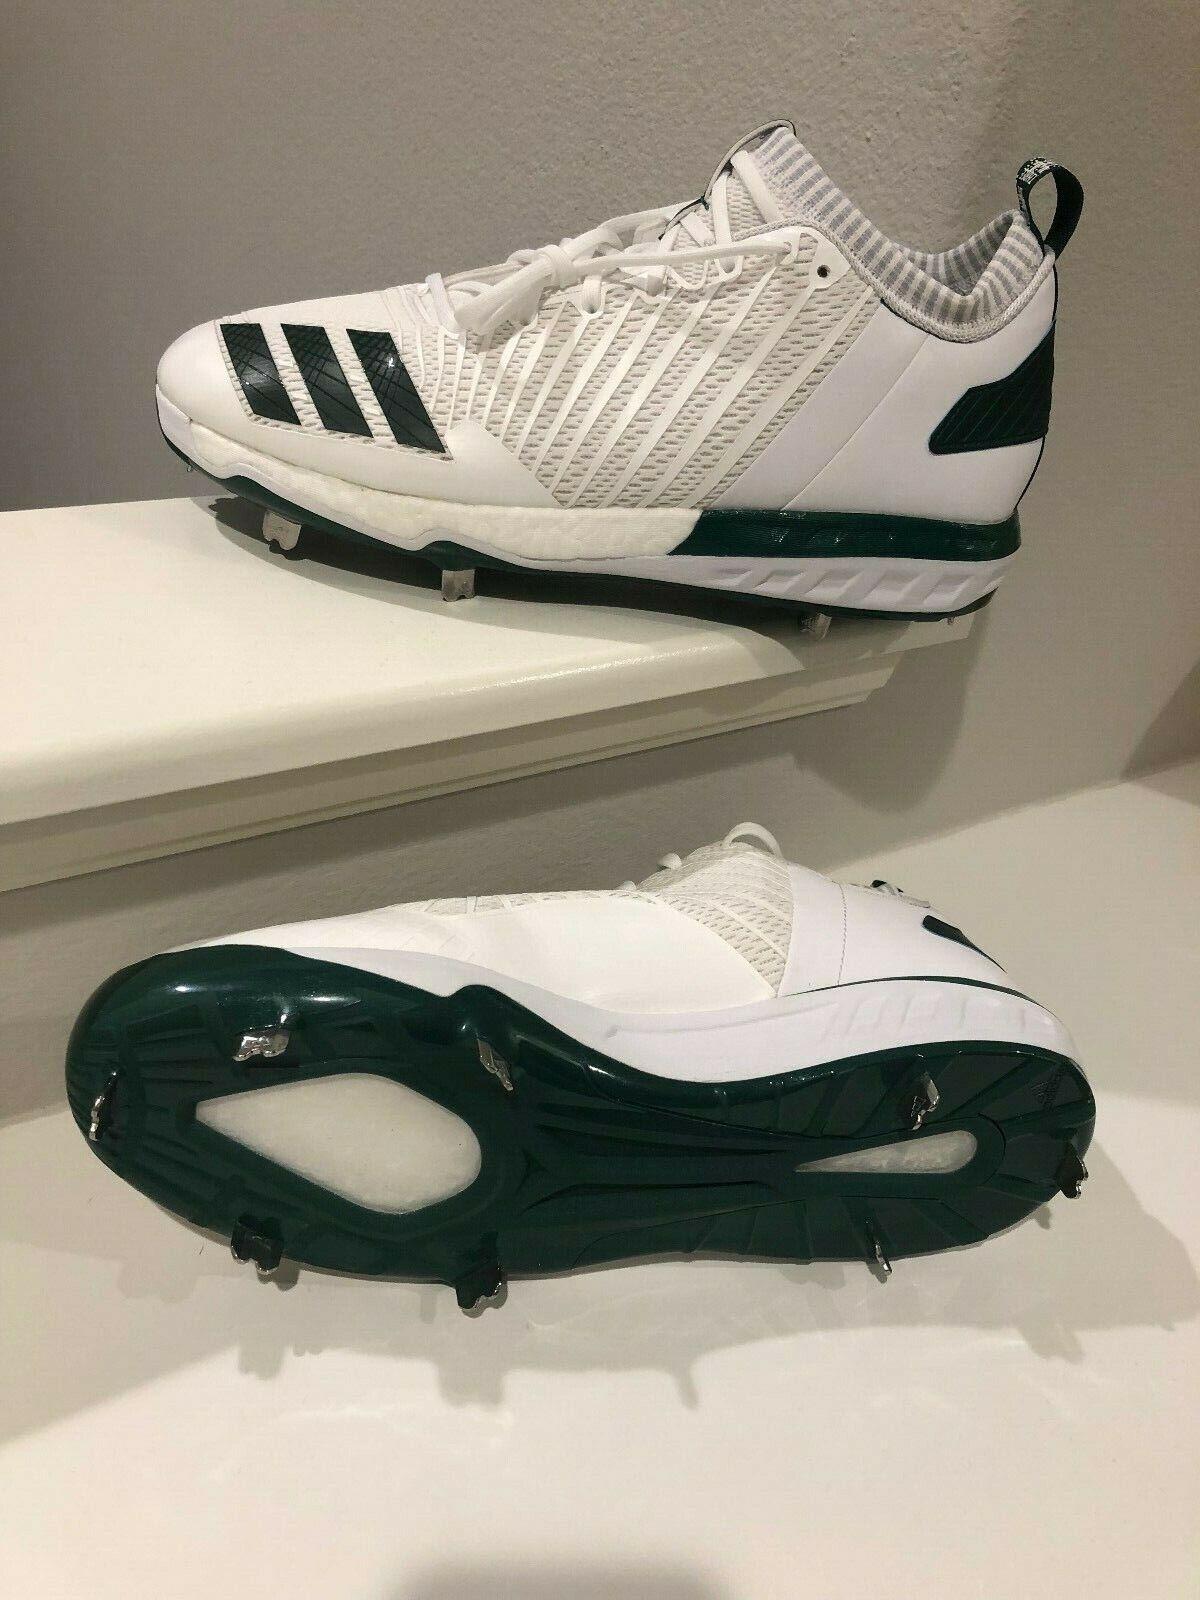 Adidas Adizero 5 star SIZE 14 white with green BRAND NEW NEVER WORN SHIPS FREE